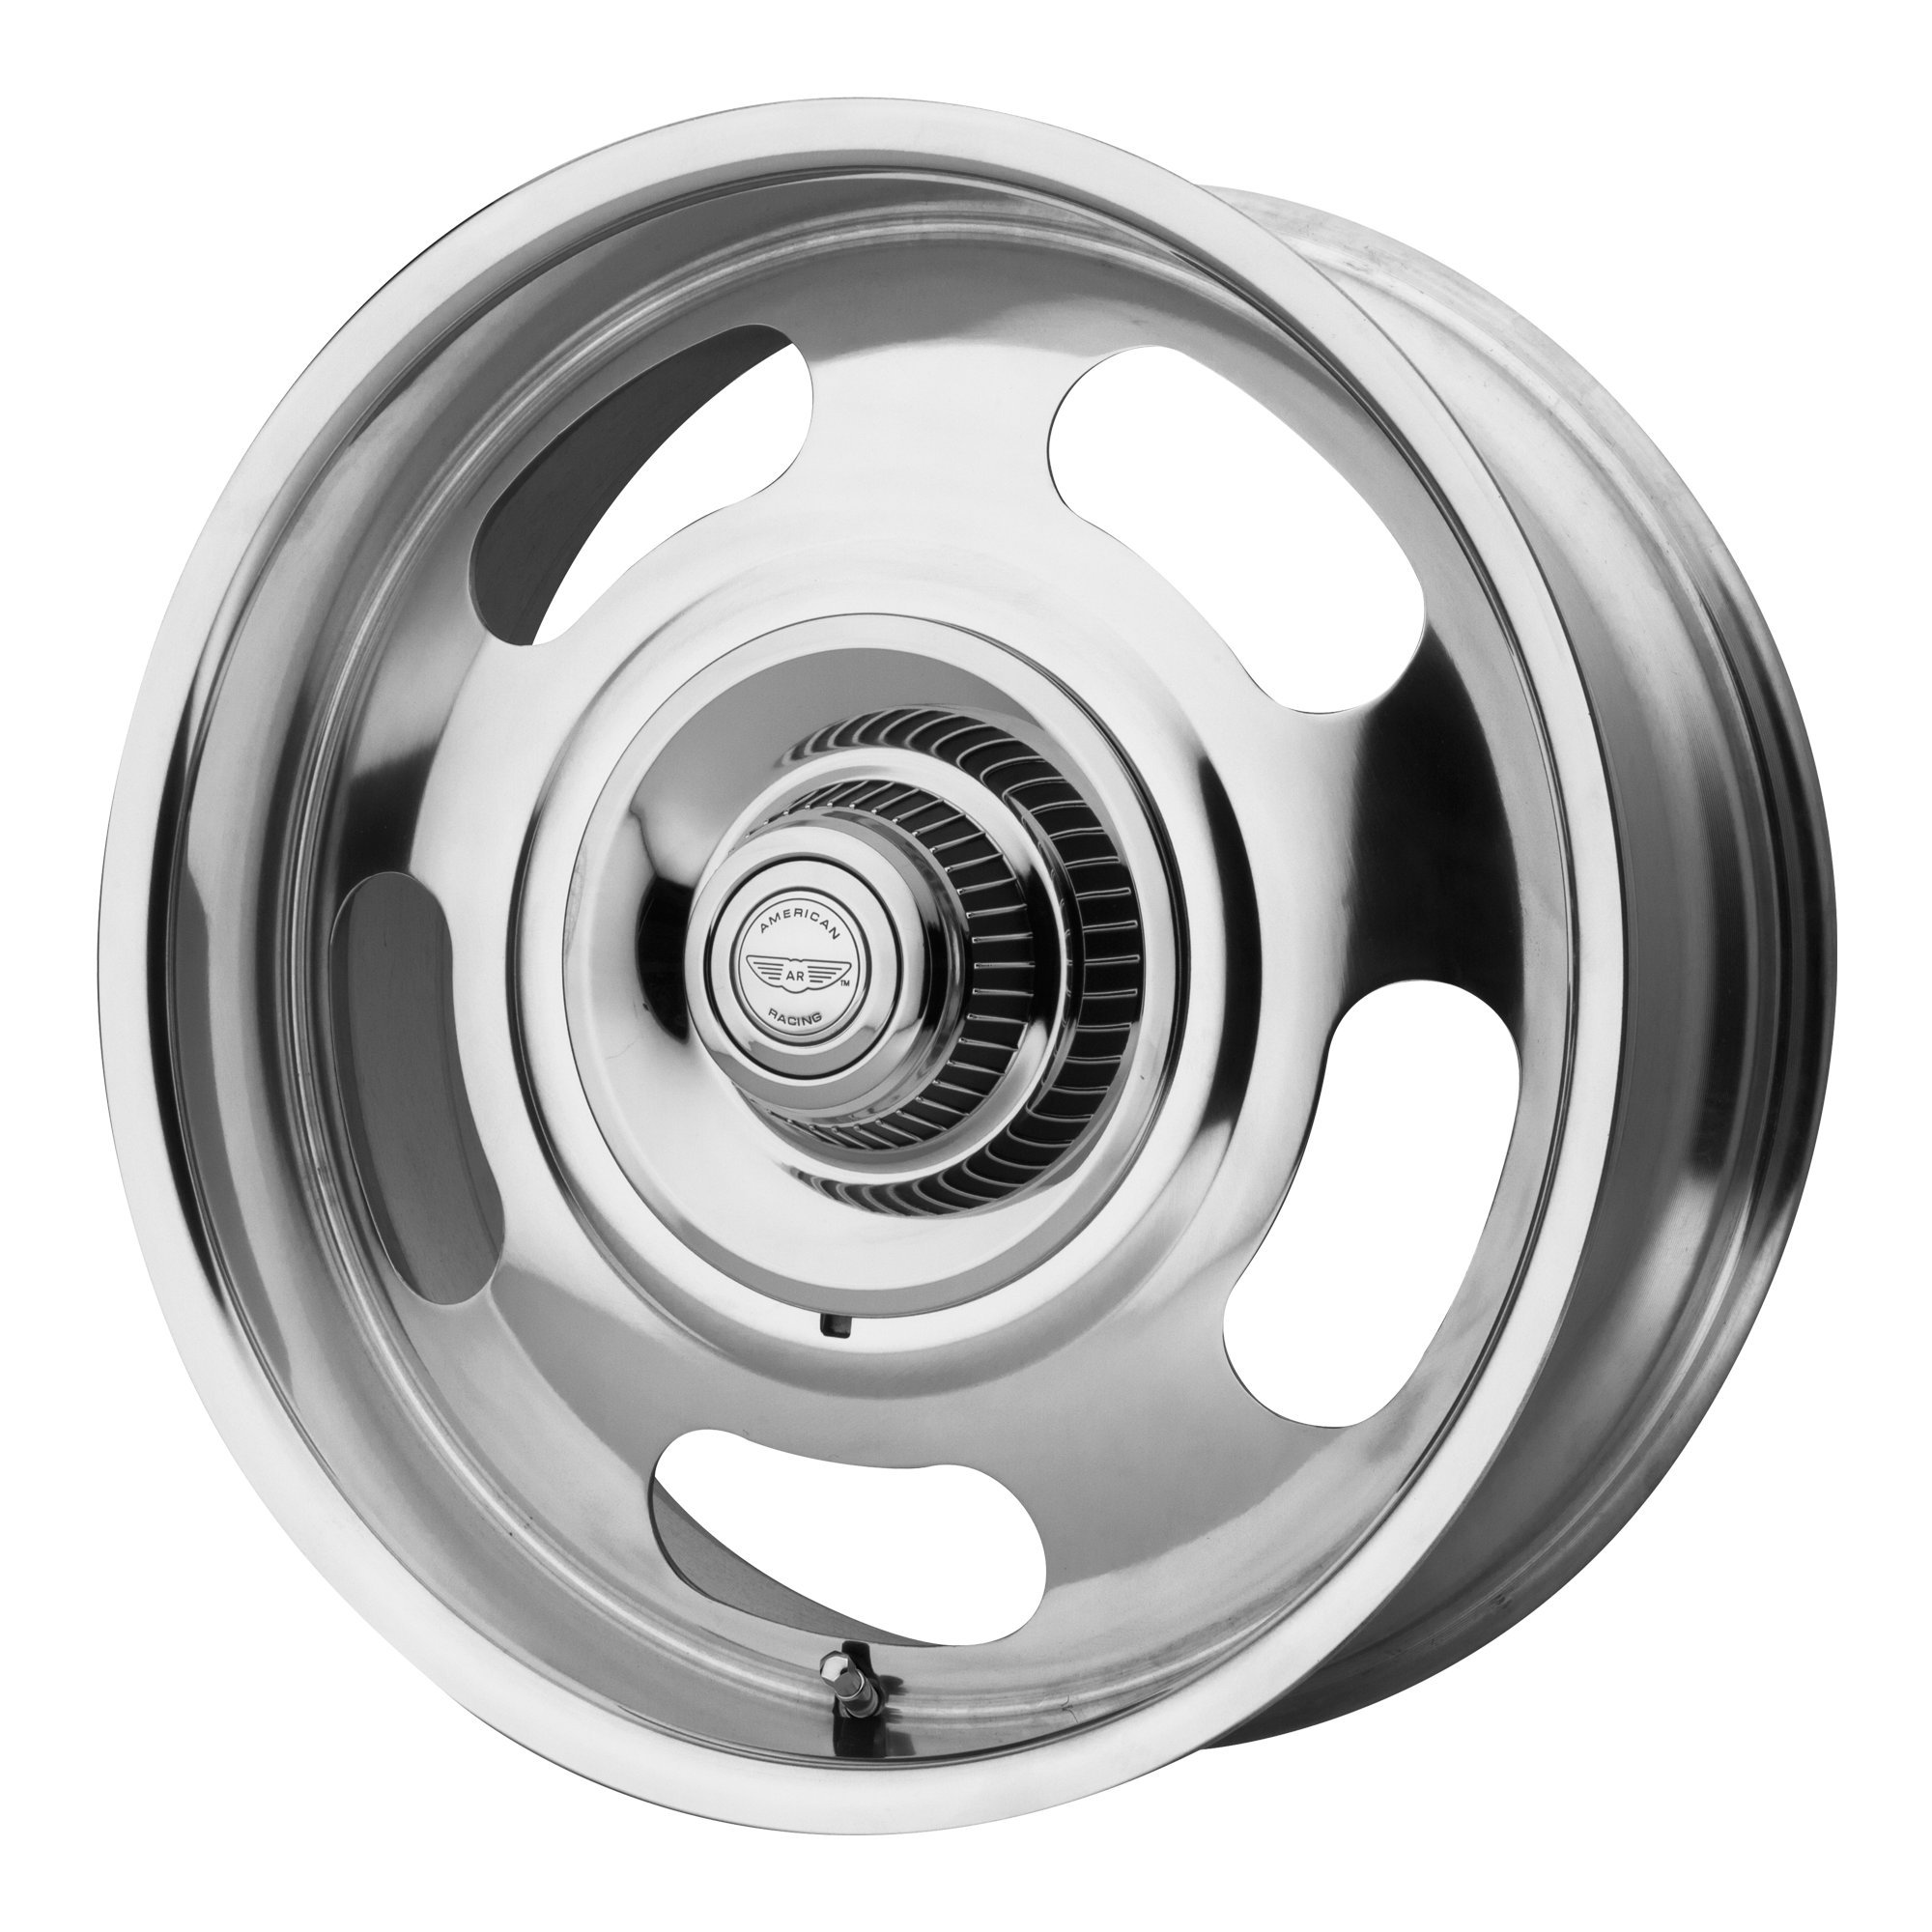 American Racing | VN50629506100 | 20 Inch | VN5061 Wheel/Rim | Polished | 20x9.5 Inch | 5x120.65/5x127.00/5x4.75/5.0 | 0mm Offset by American Racing (Image #1)